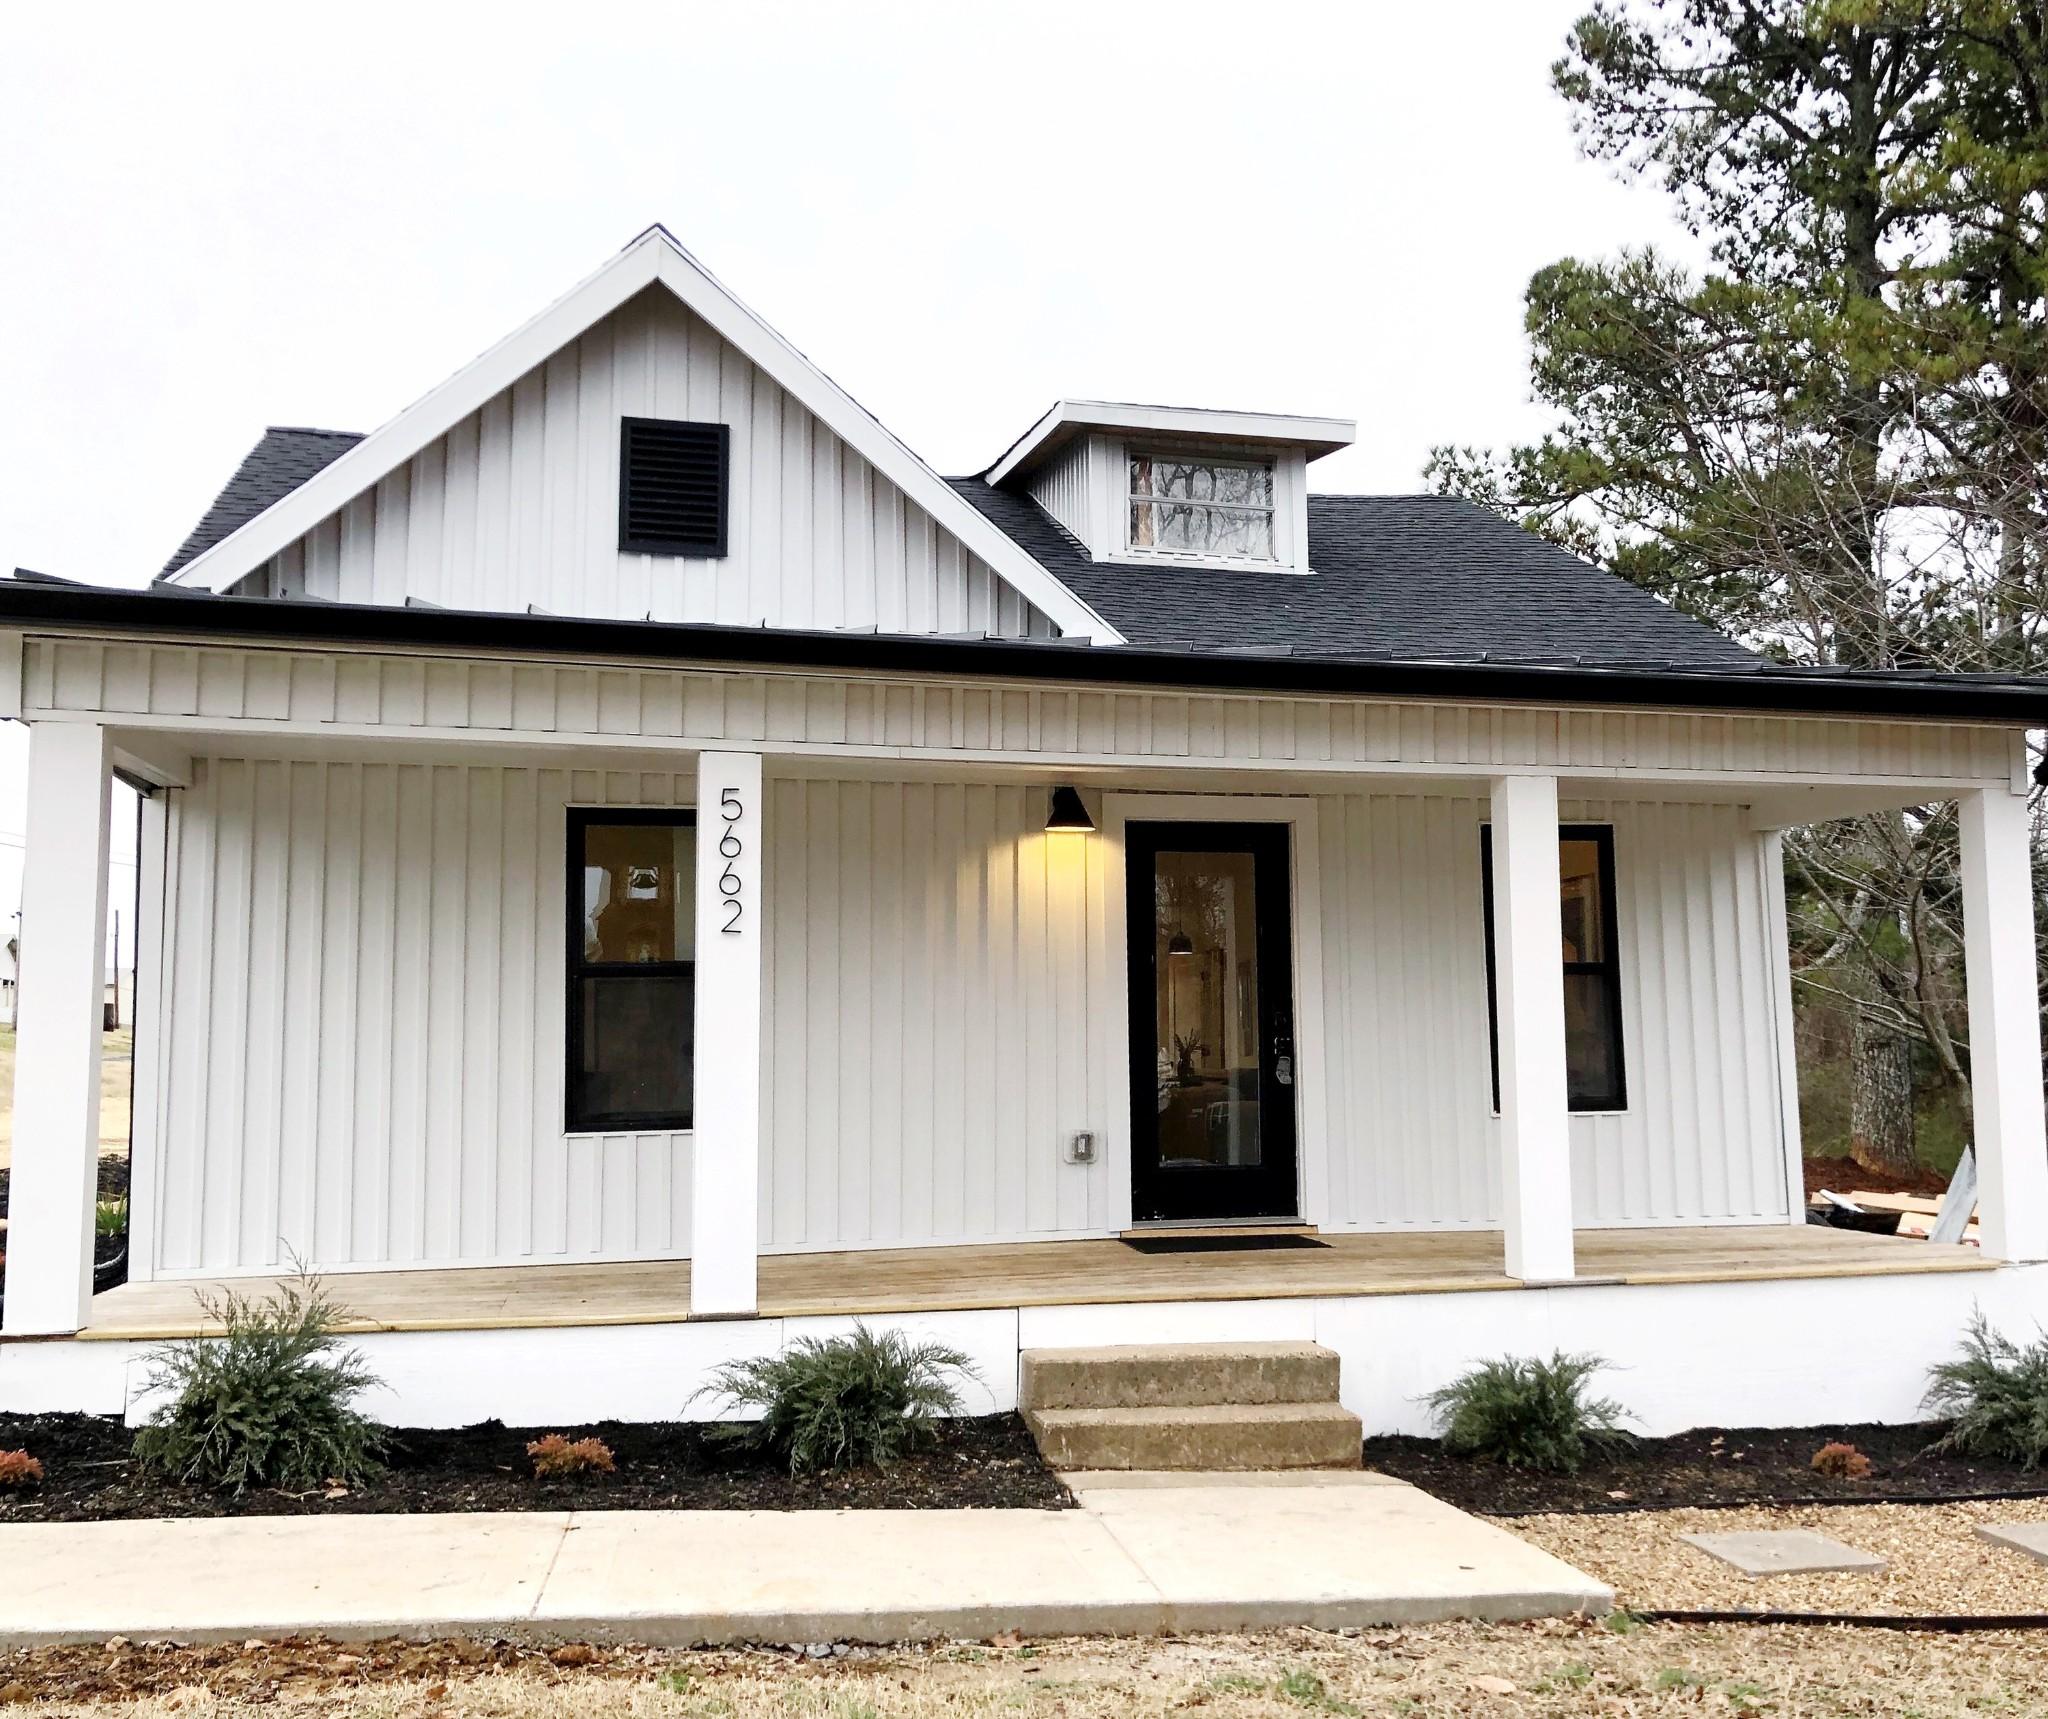 5662 Clarksville Pike, Joelton, TN 37080 - Joelton, TN real estate listing